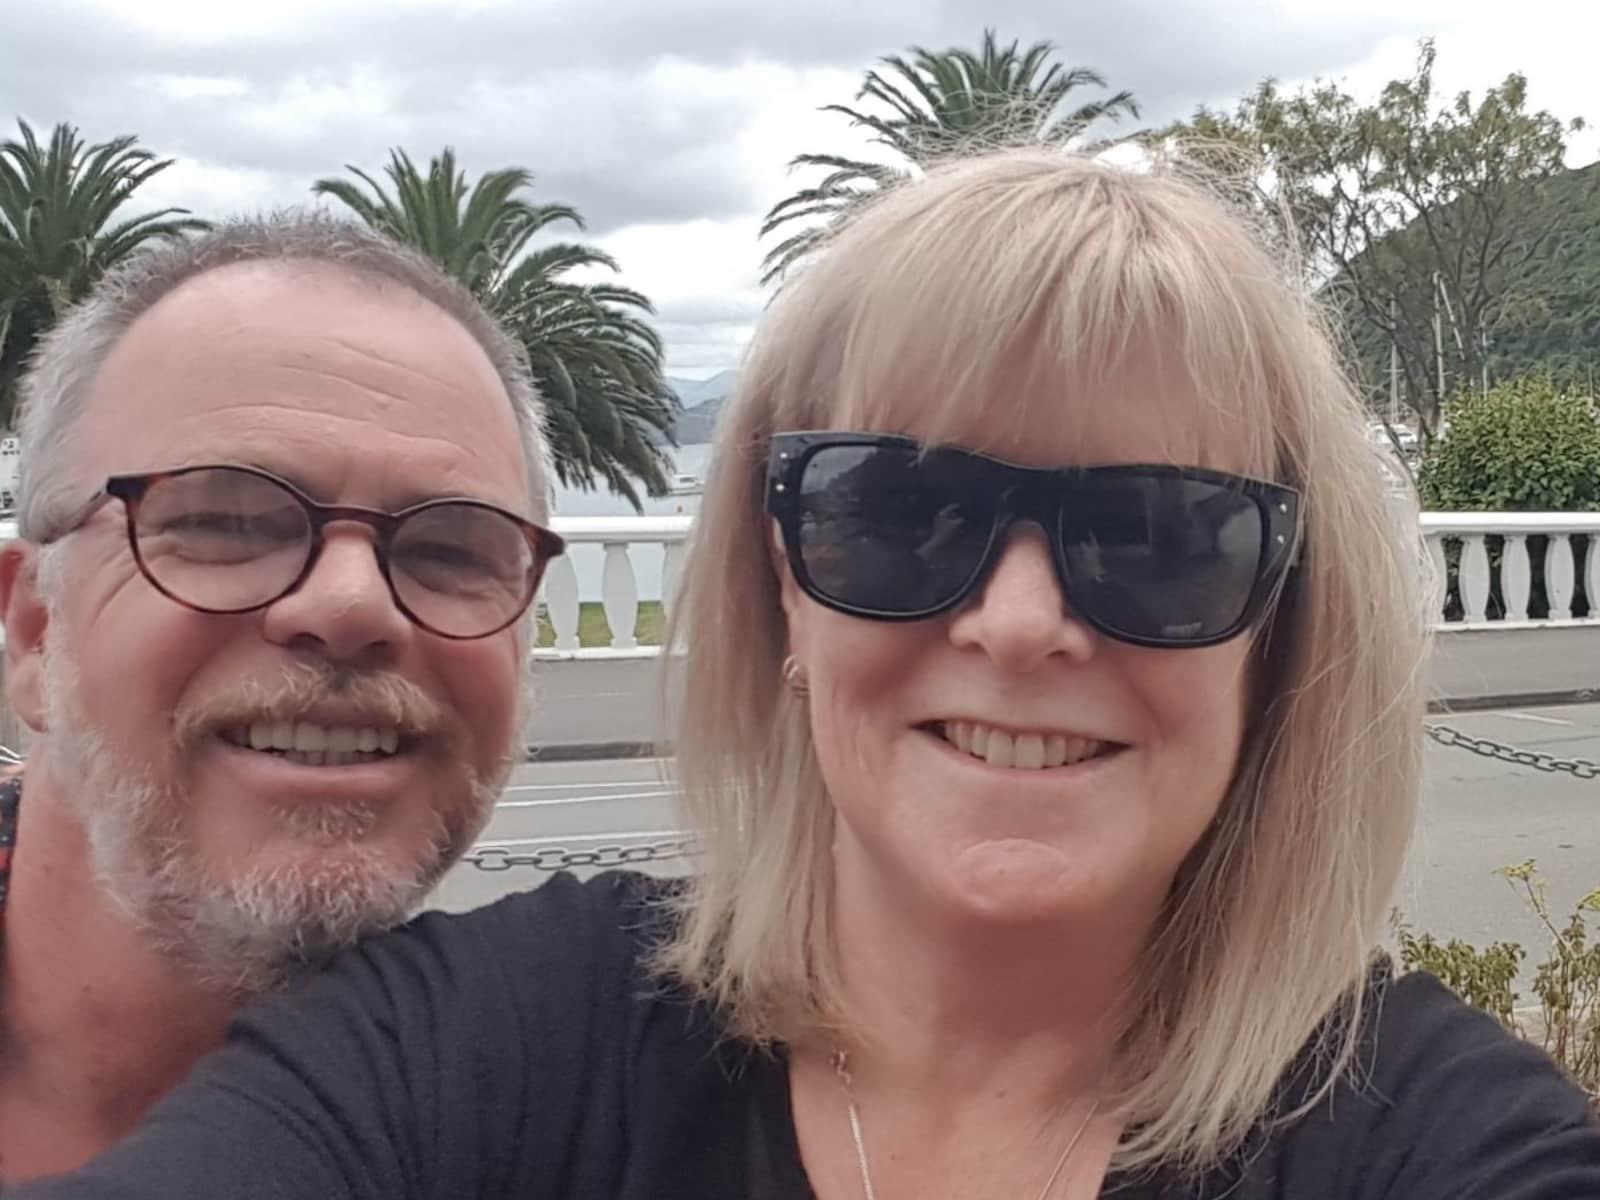 Beverley & bruce & Bruce from Dunedin, New Zealand